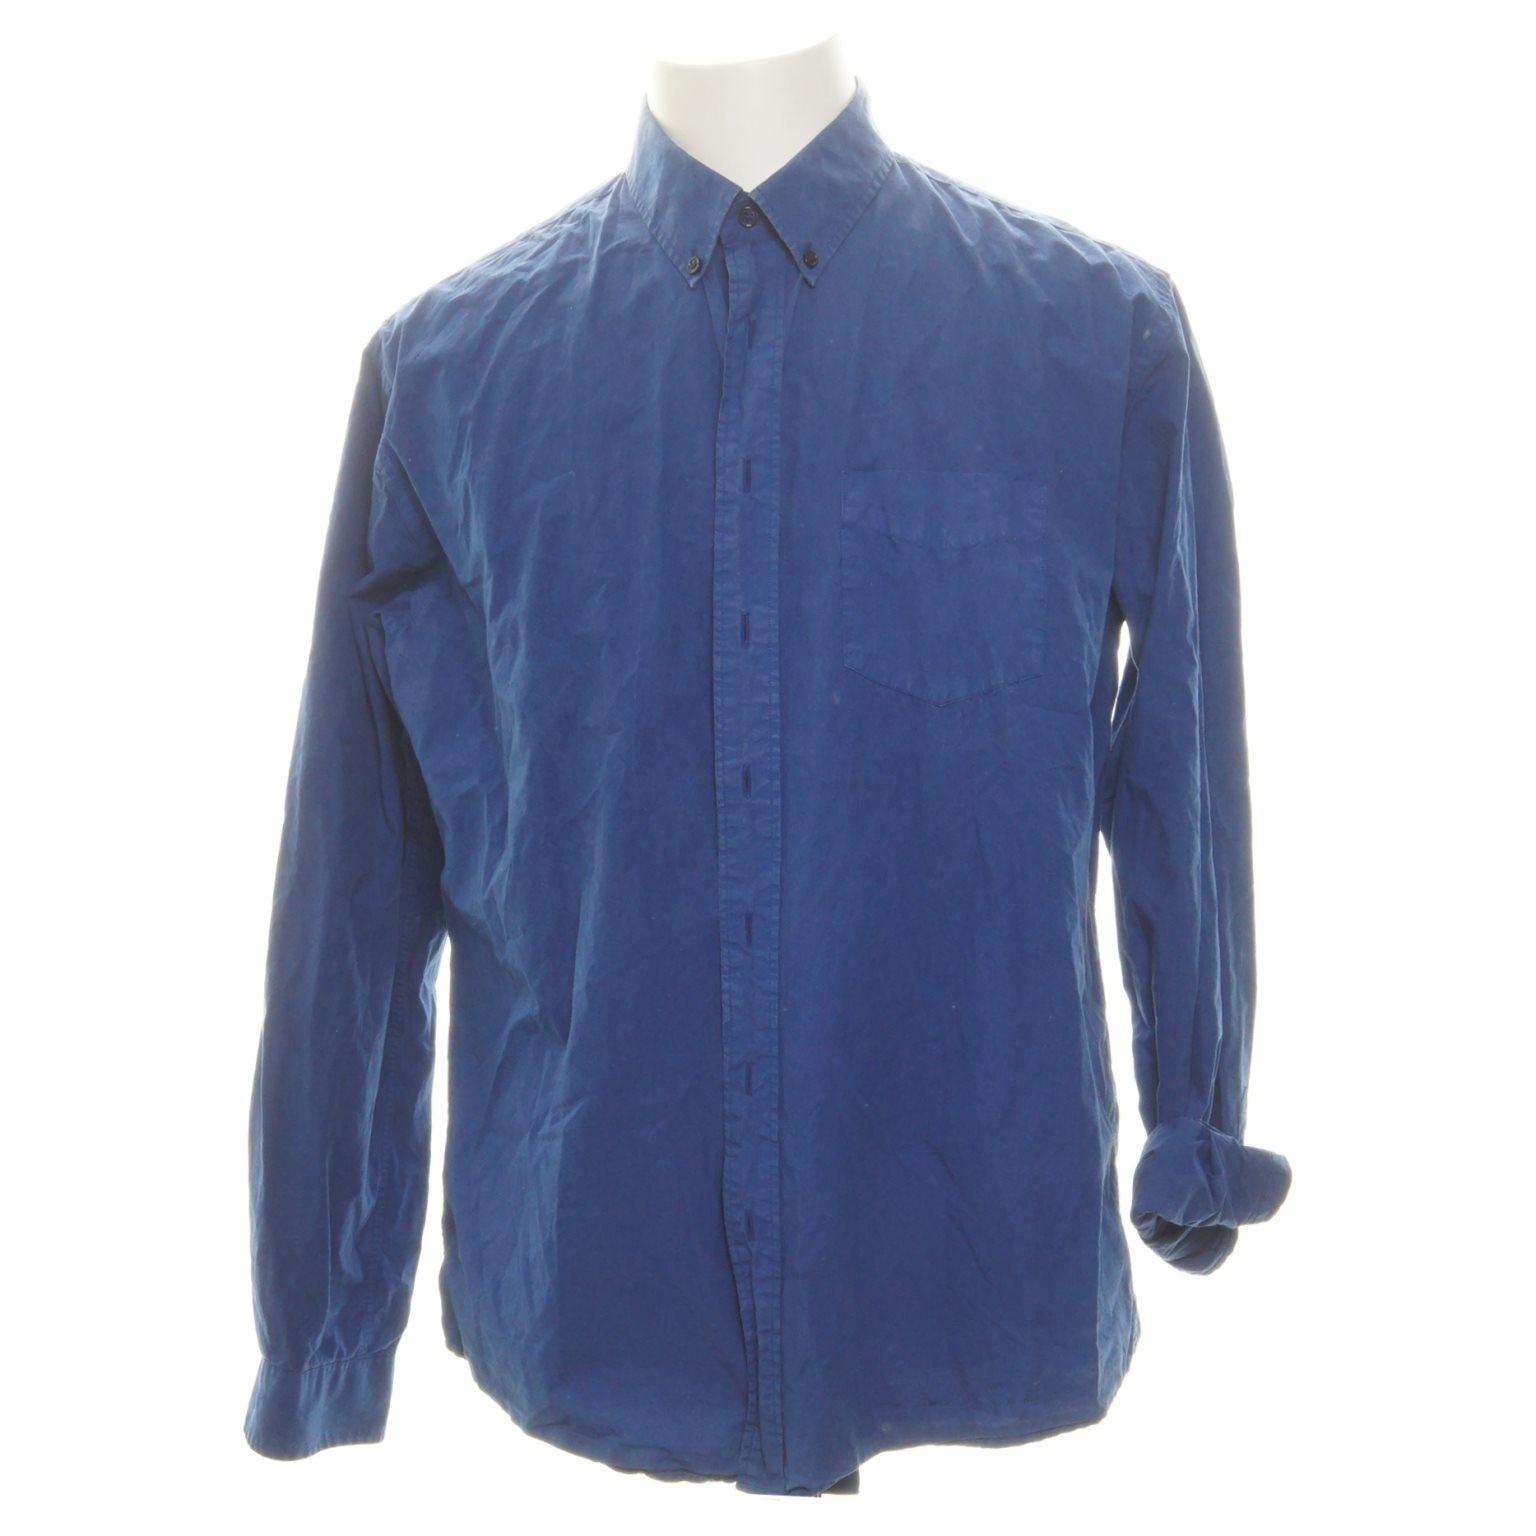 Schnayderman's, Oxfordskjorta, Strl: 43, Blå